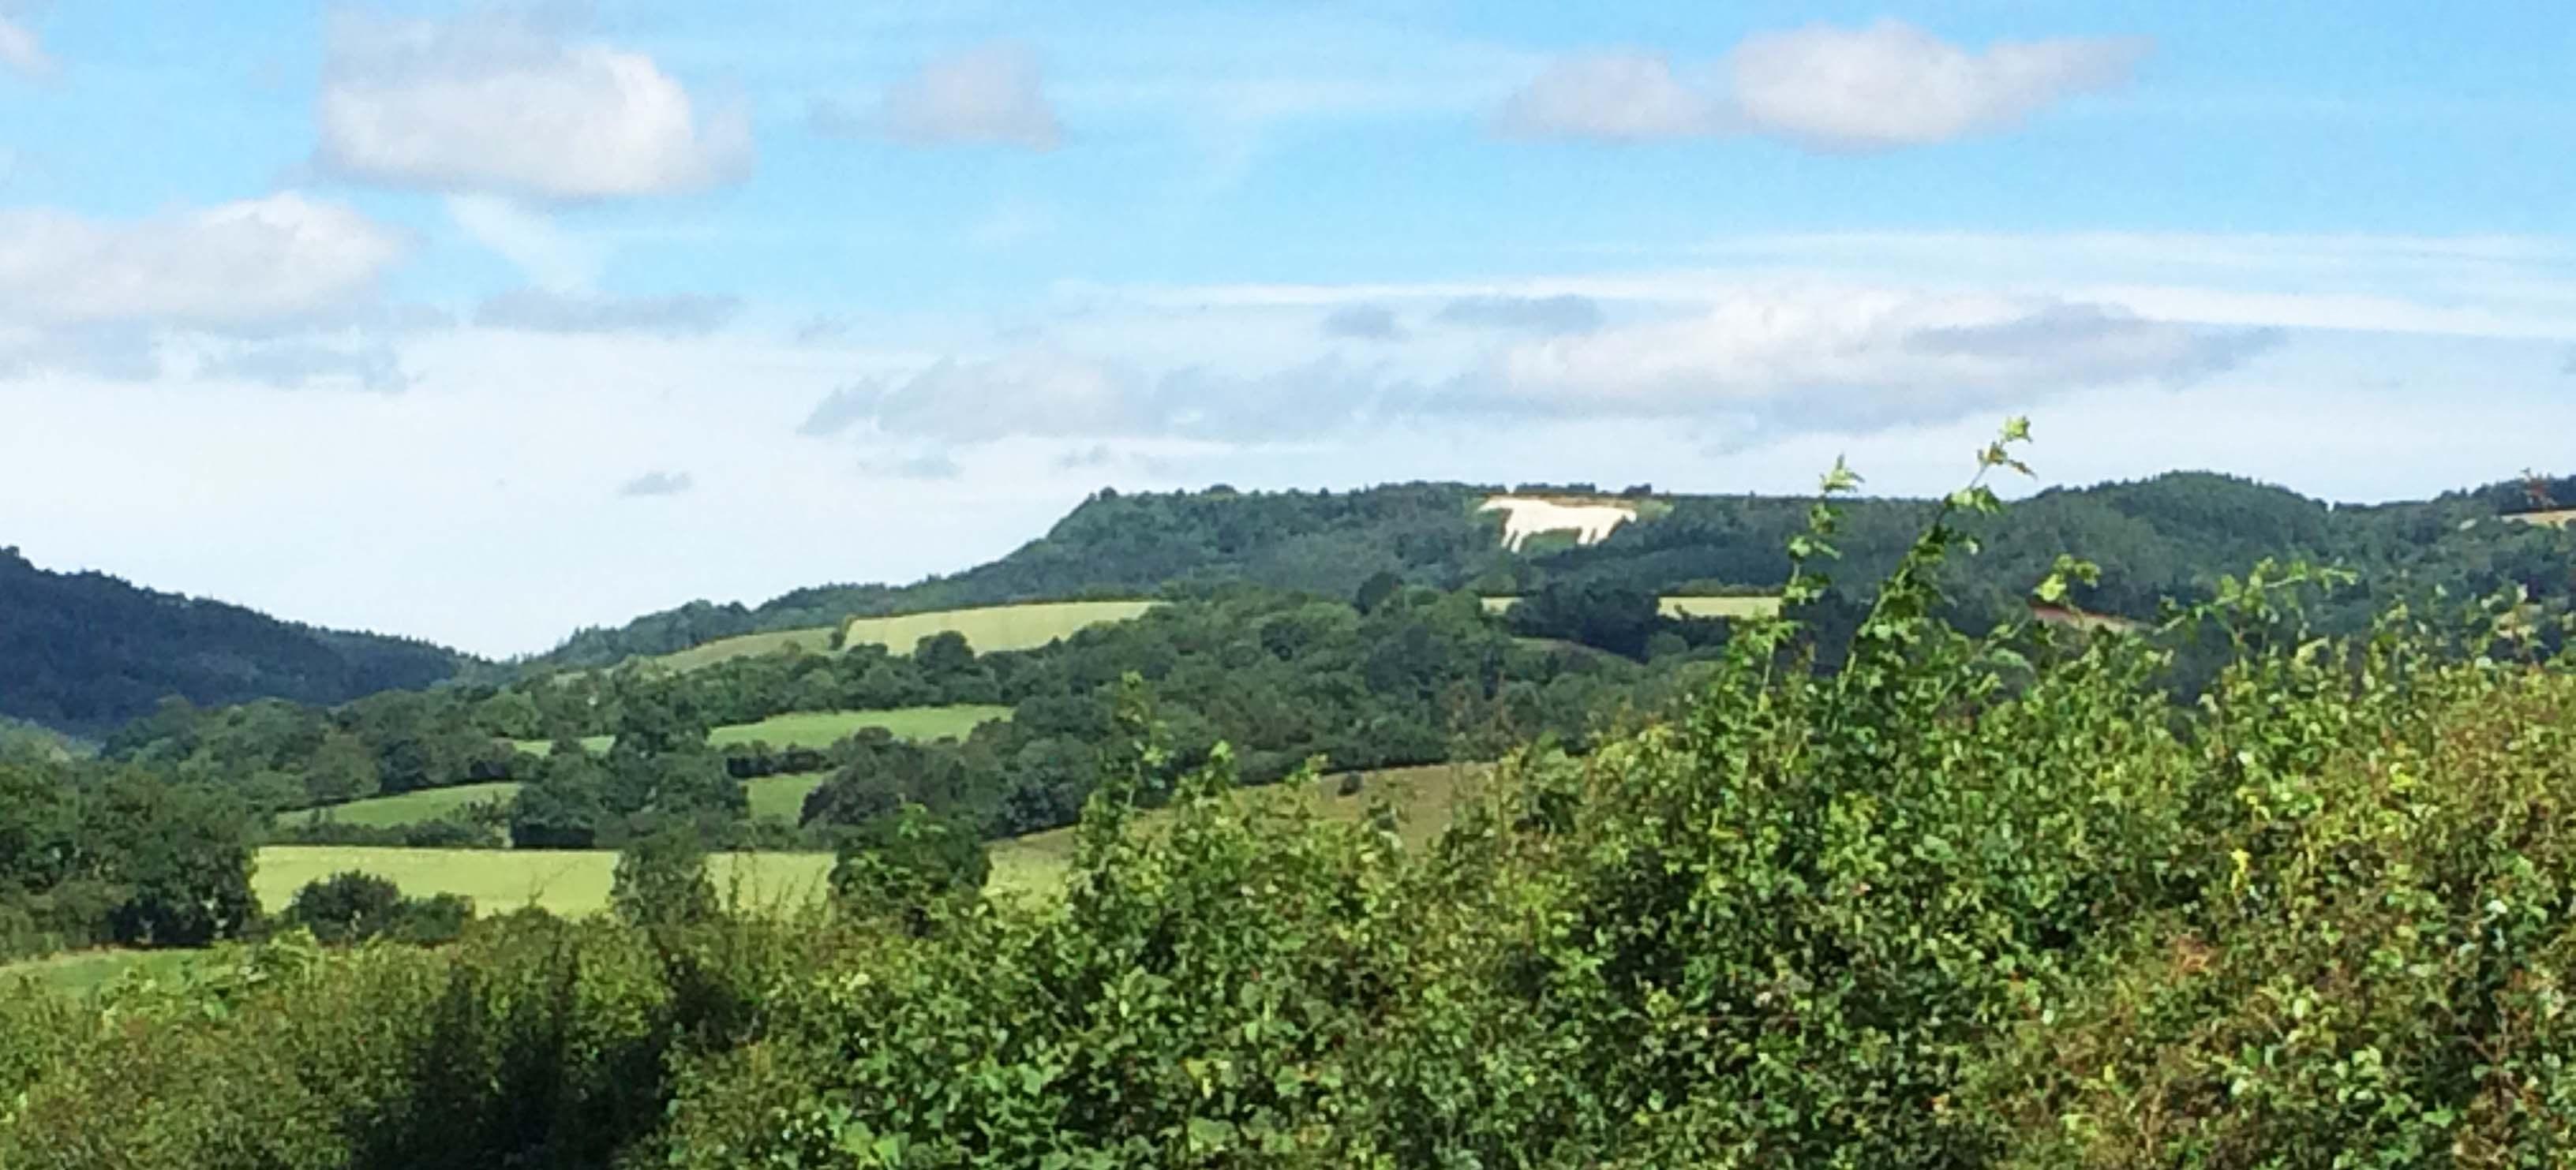 White Horse Ryedale Yorkshire